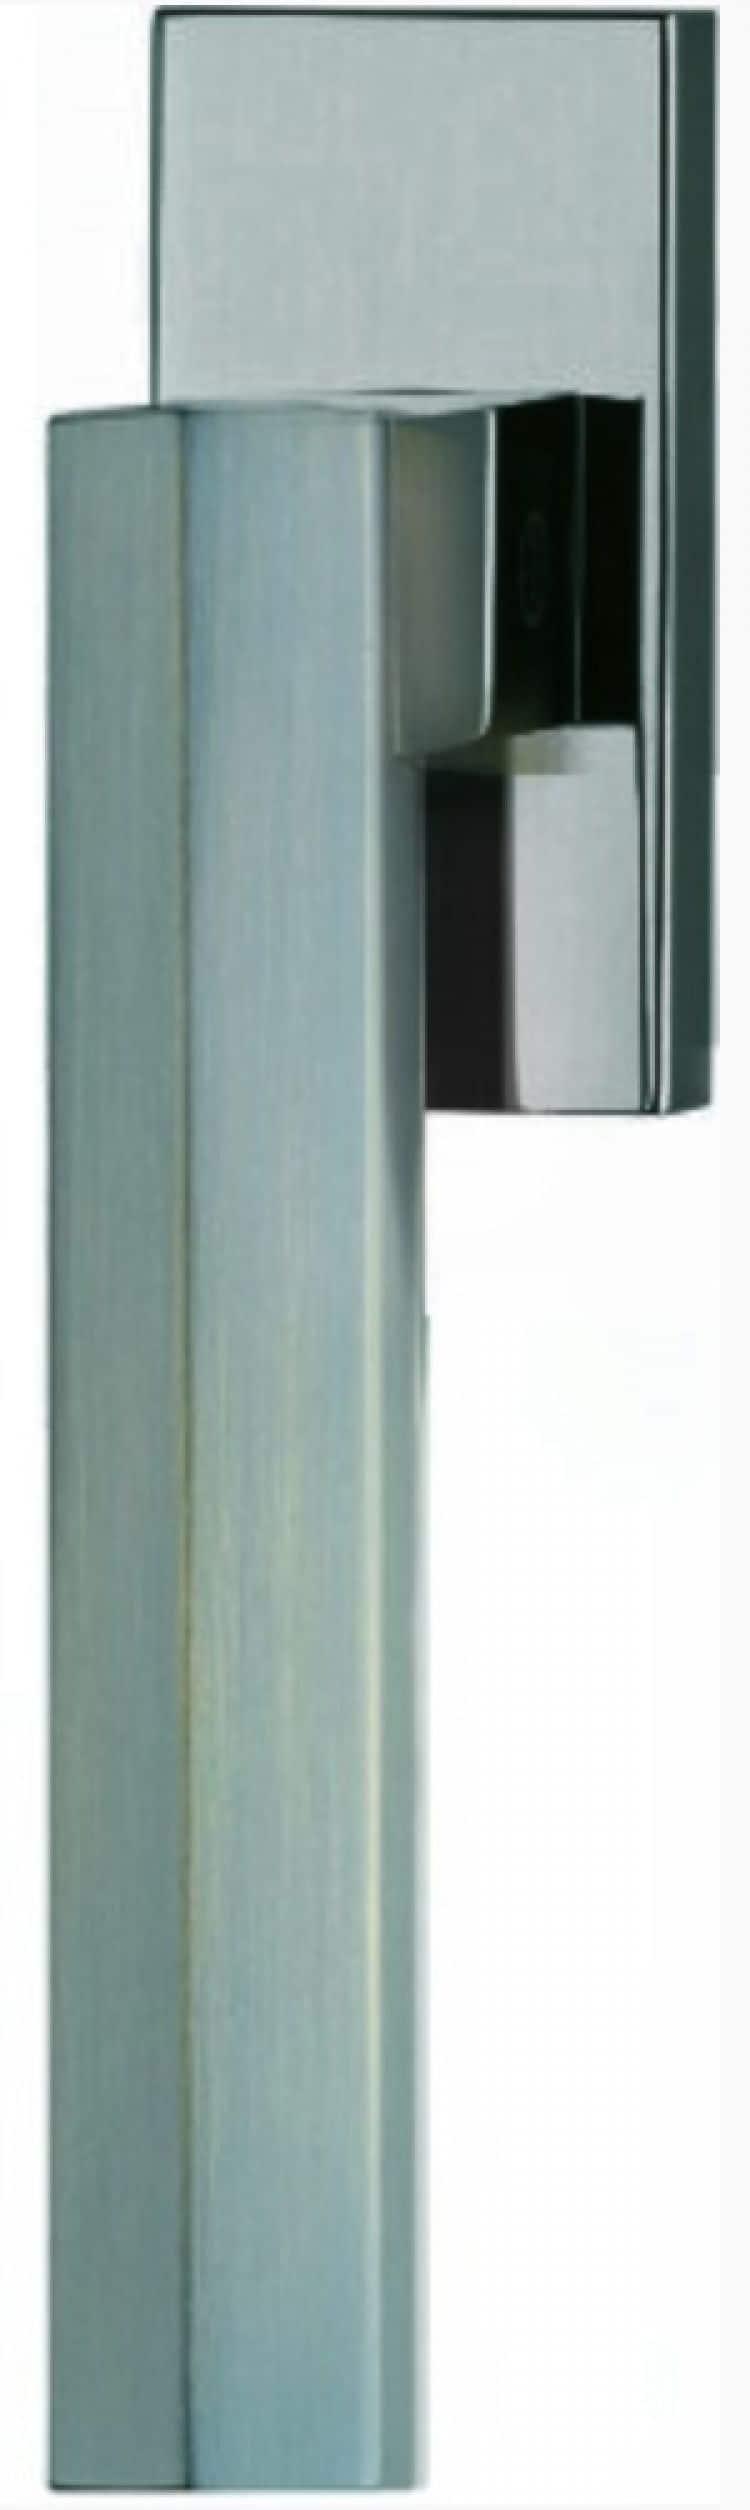 Maniglie finestre valli valli serie h 1040 siberia for Maniglie valli